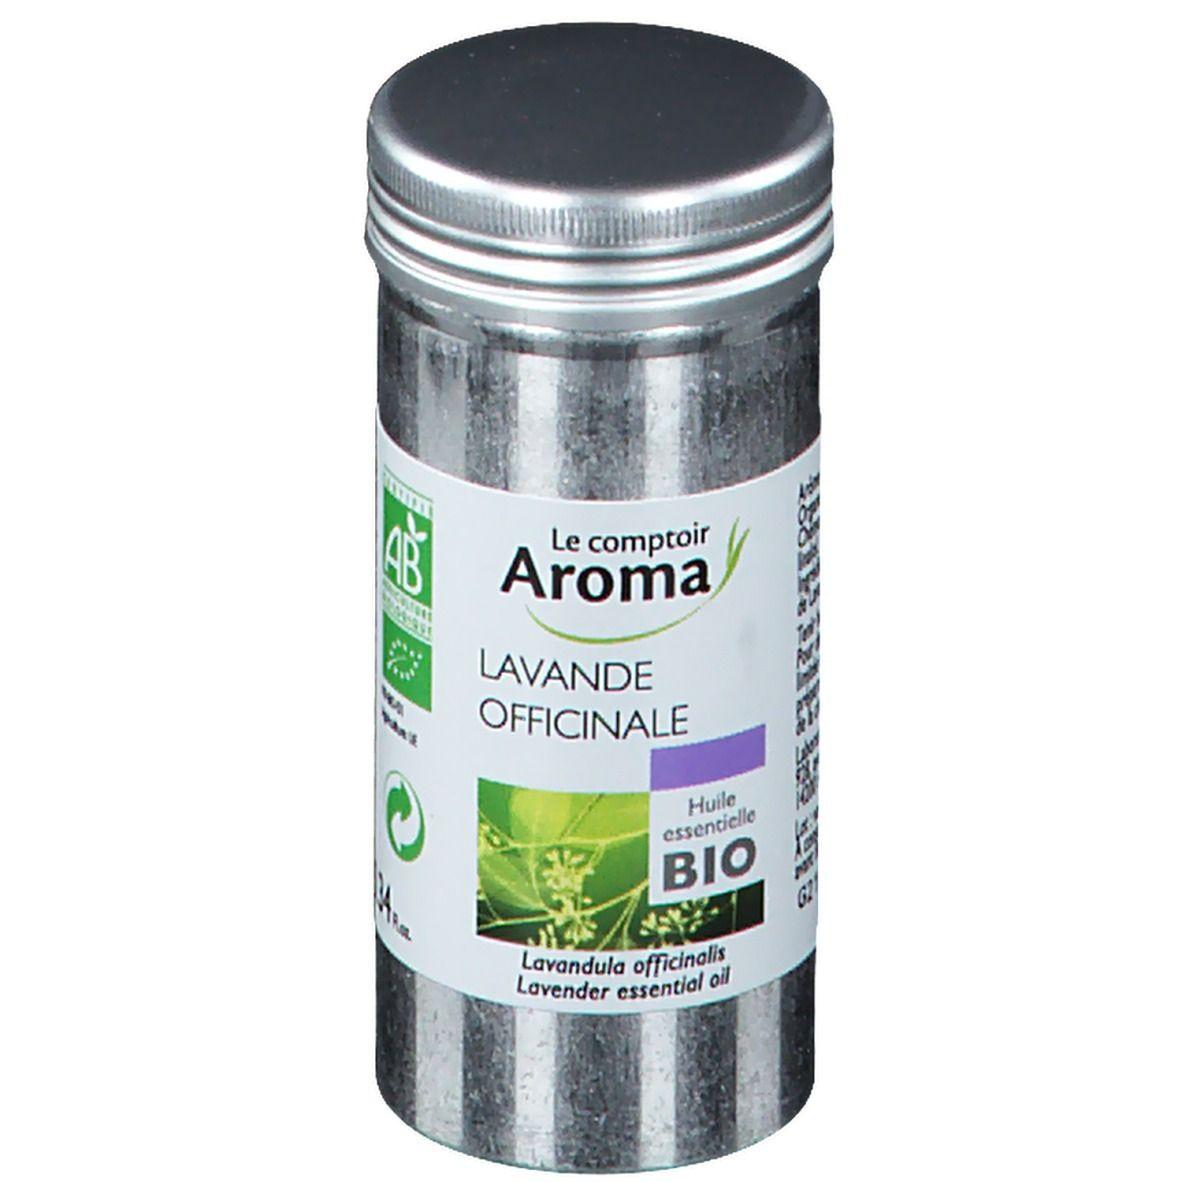 Le Comptoir Aroma huile essentielle bio Lavande officinale ml huile